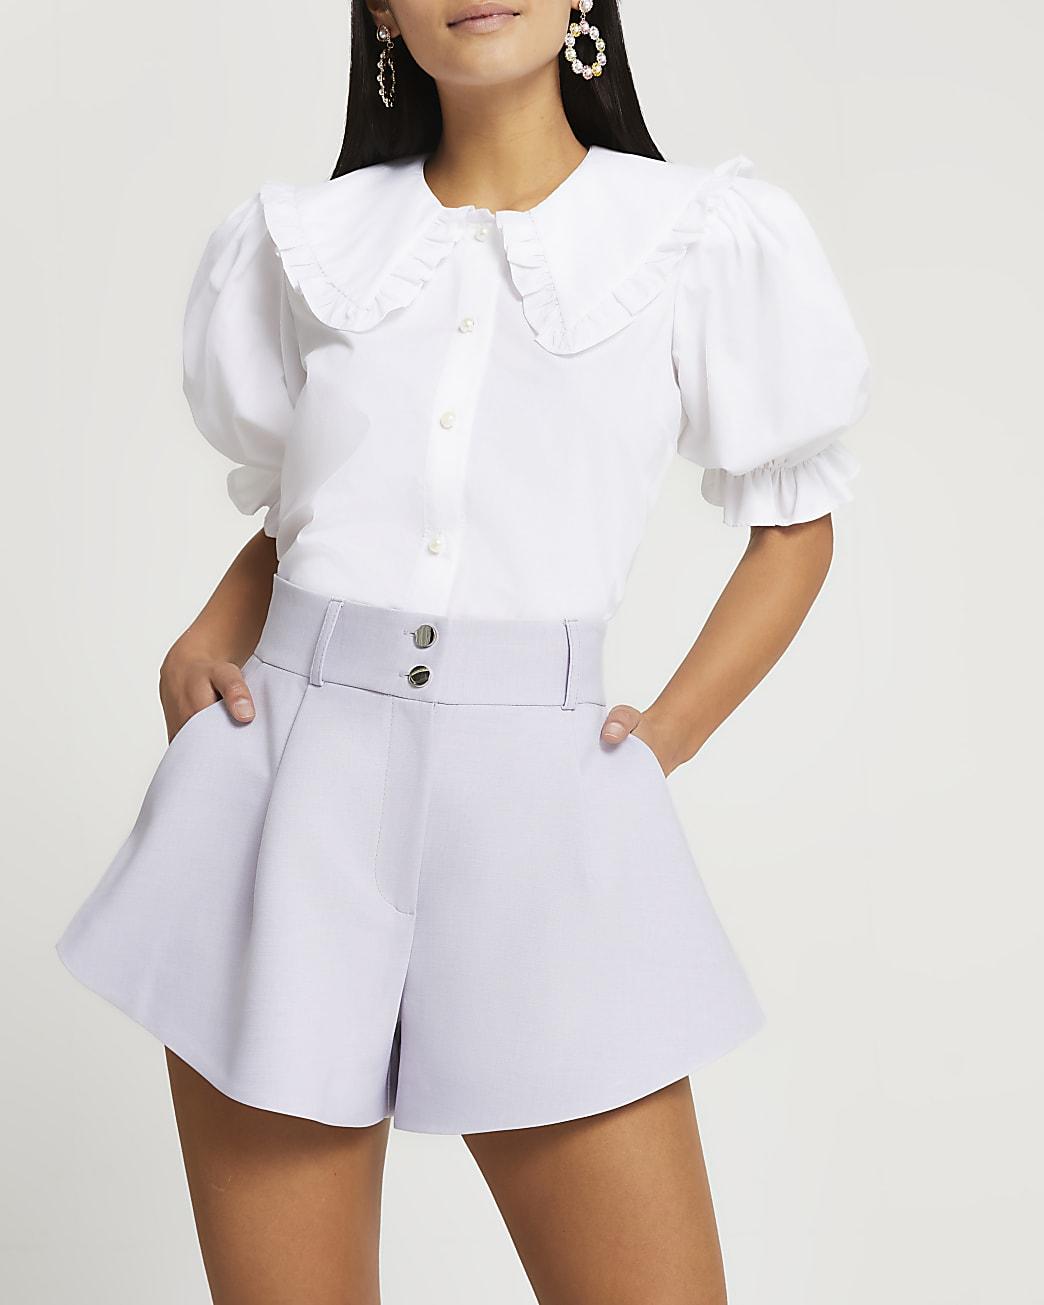 Petite purple structured double button shorts